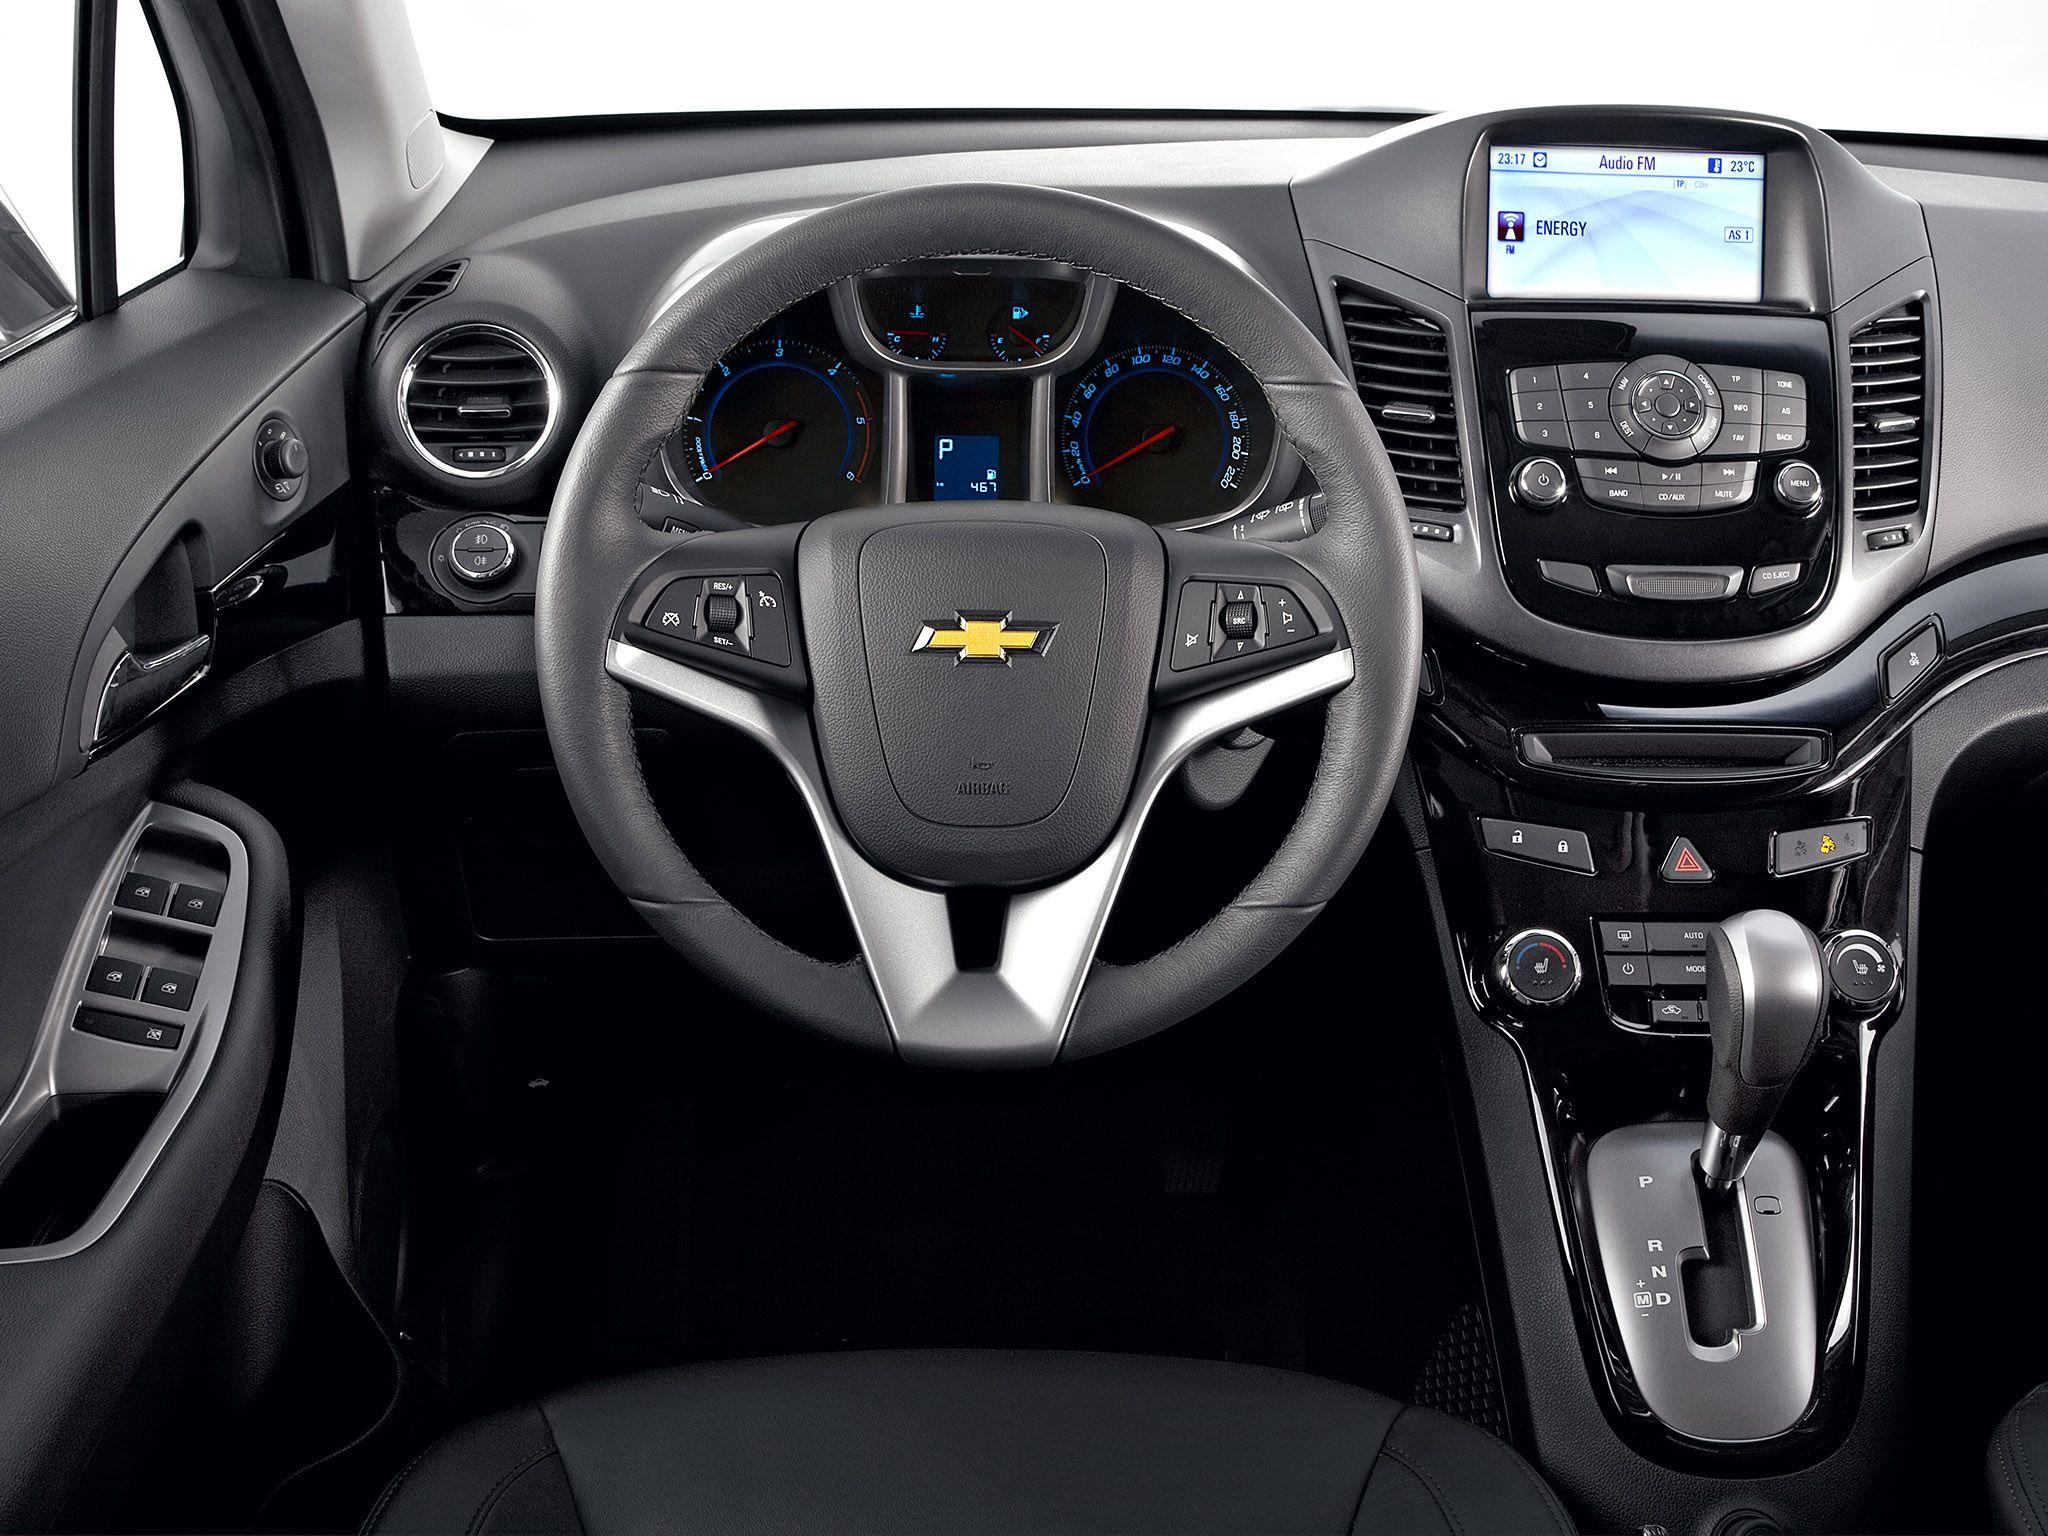 2012 Chevrolet Orlando Mpv Car Interior Dashboard Chevrolet Orlando Chevrolet Latest Cars